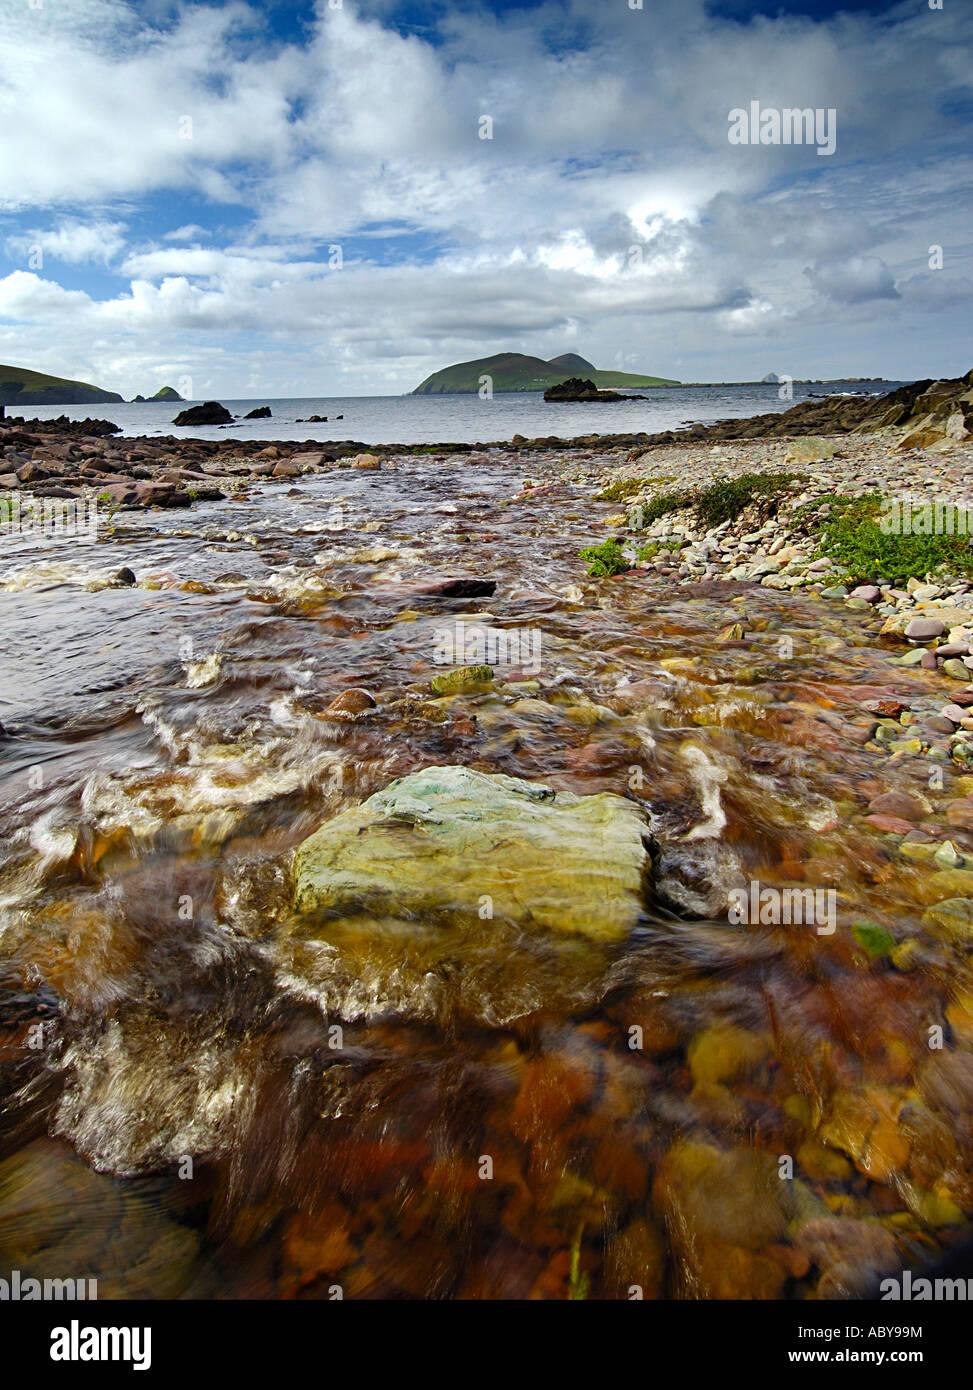 Looking towards Great Blasket Island from Dunquin Dingle Penninsula Co Kerry Ireland - Stock Image